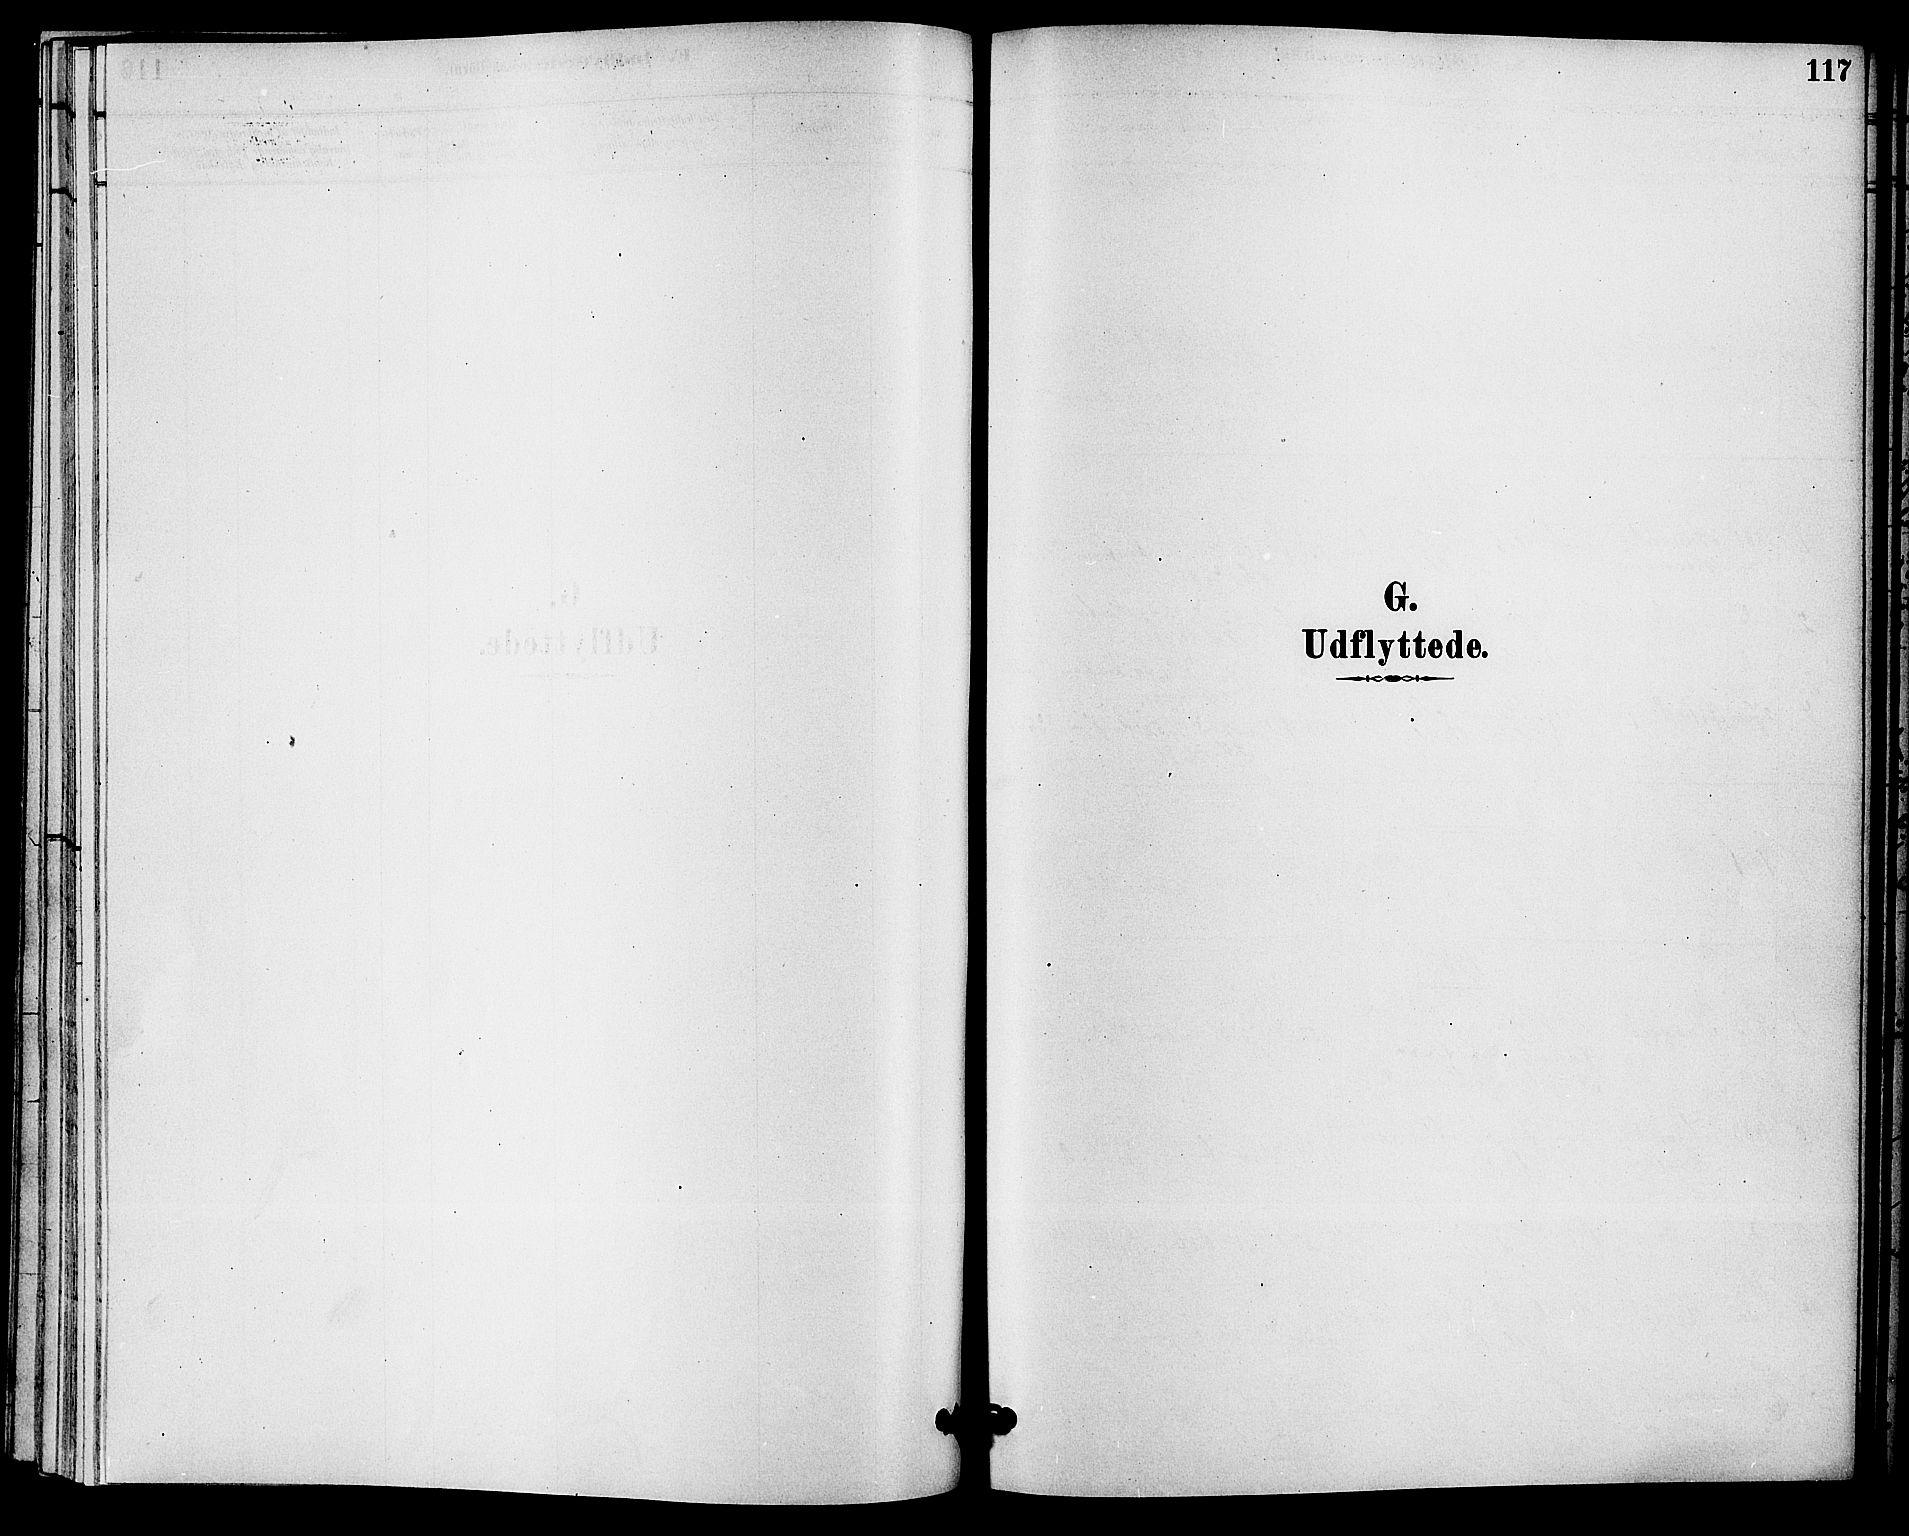 SAKO, Solum kirkebøker, F/Fc/L0001: Ministerialbok nr. III 1, 1877-1891, s. 117